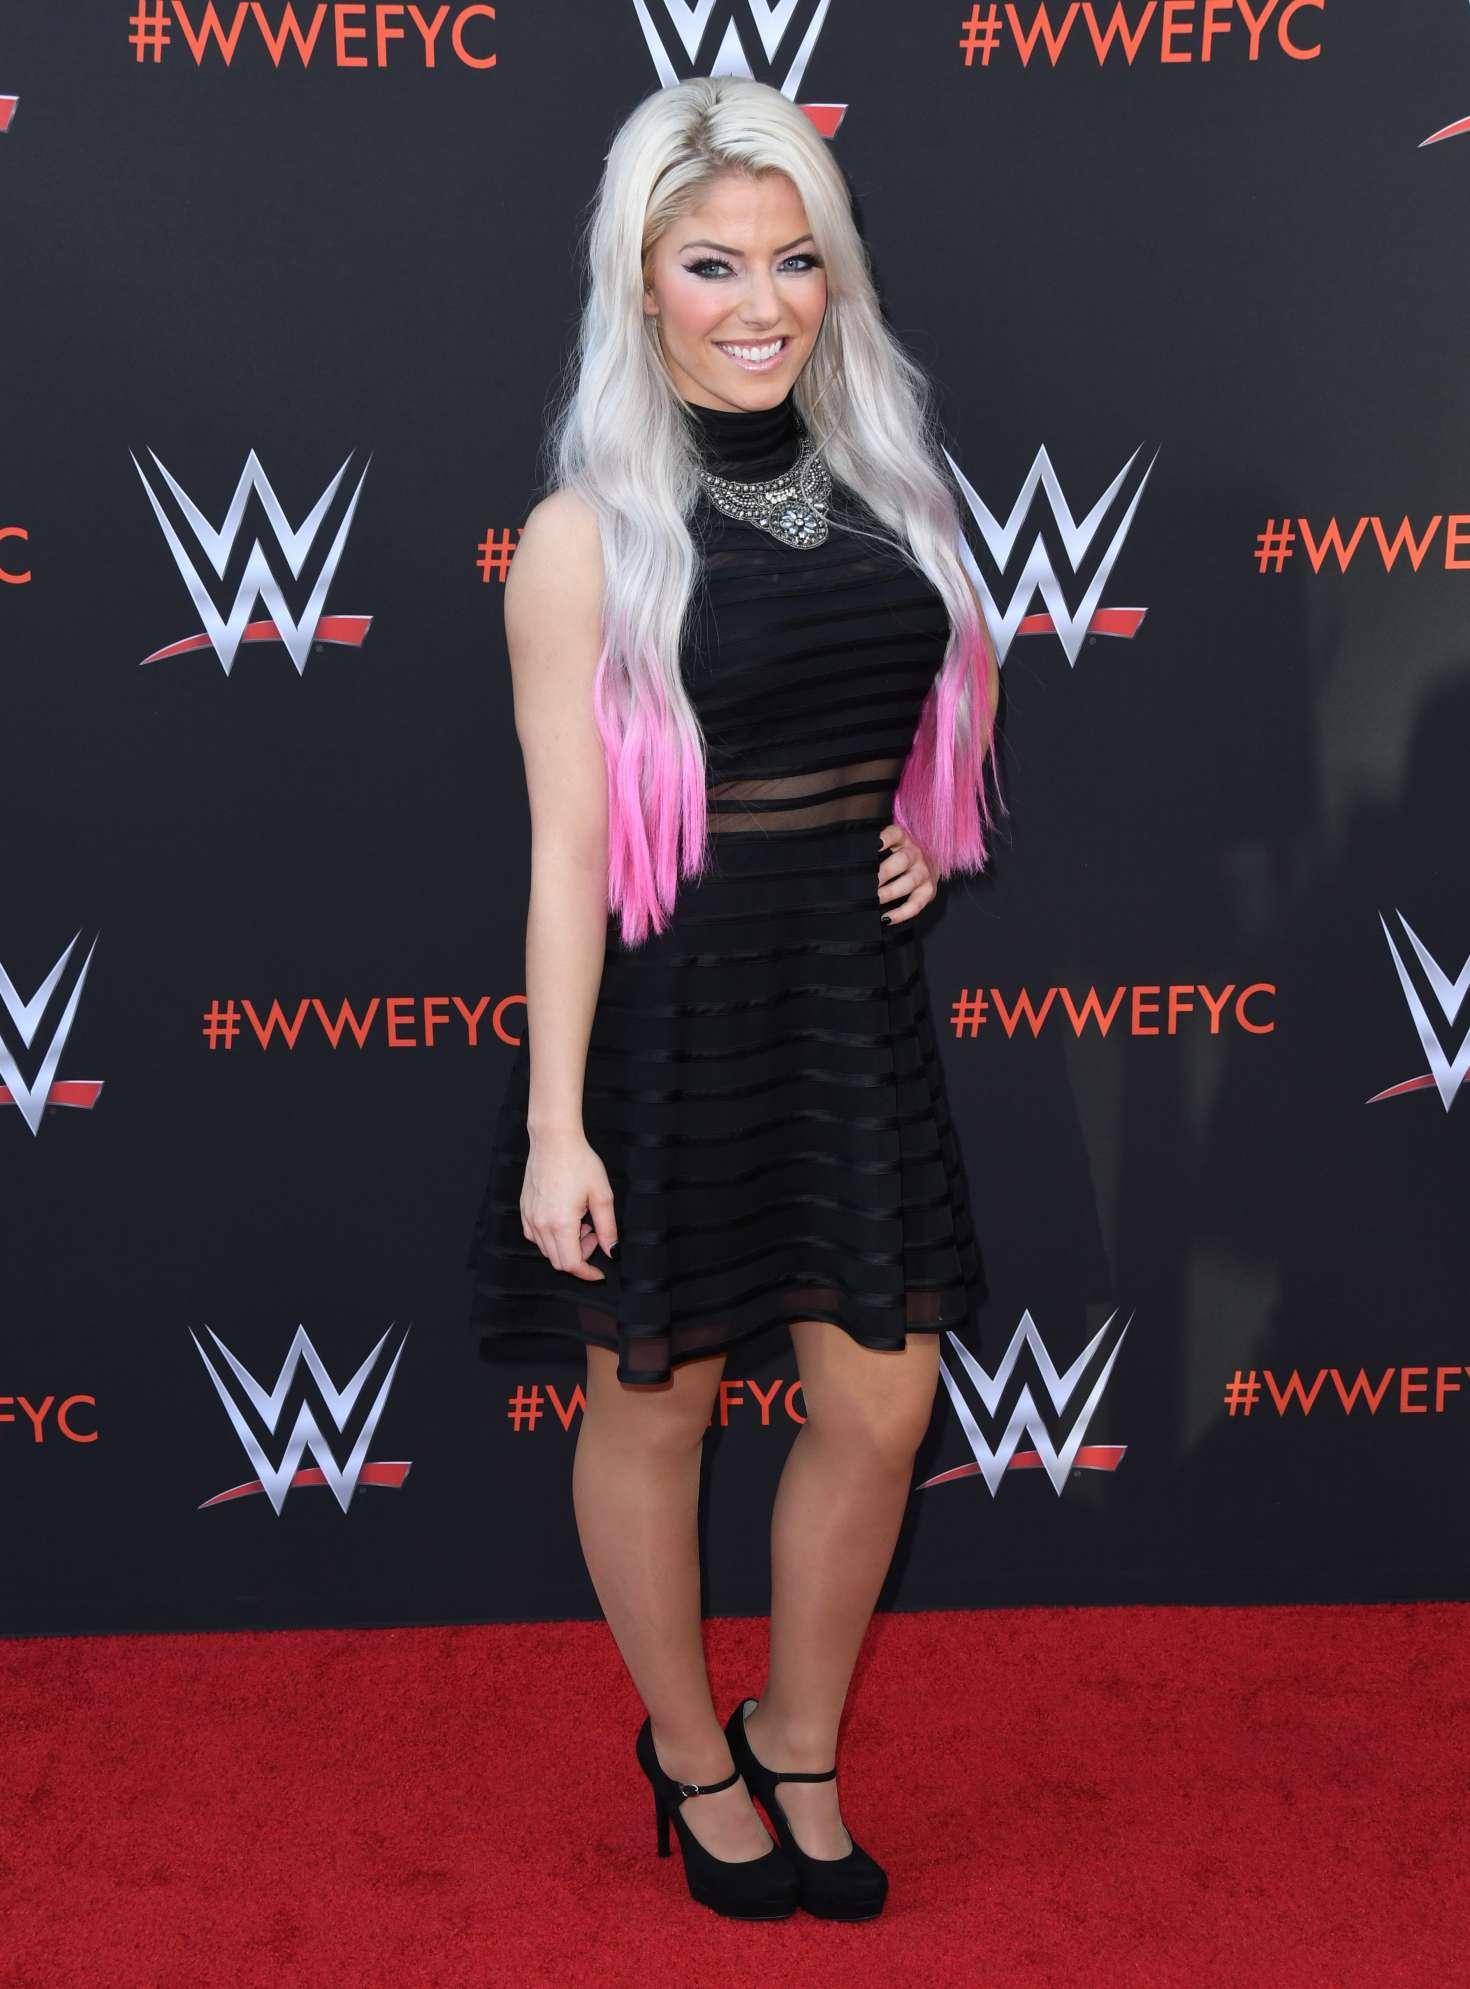 Alexa Bliss - WWE FYC Event in Los Angeles